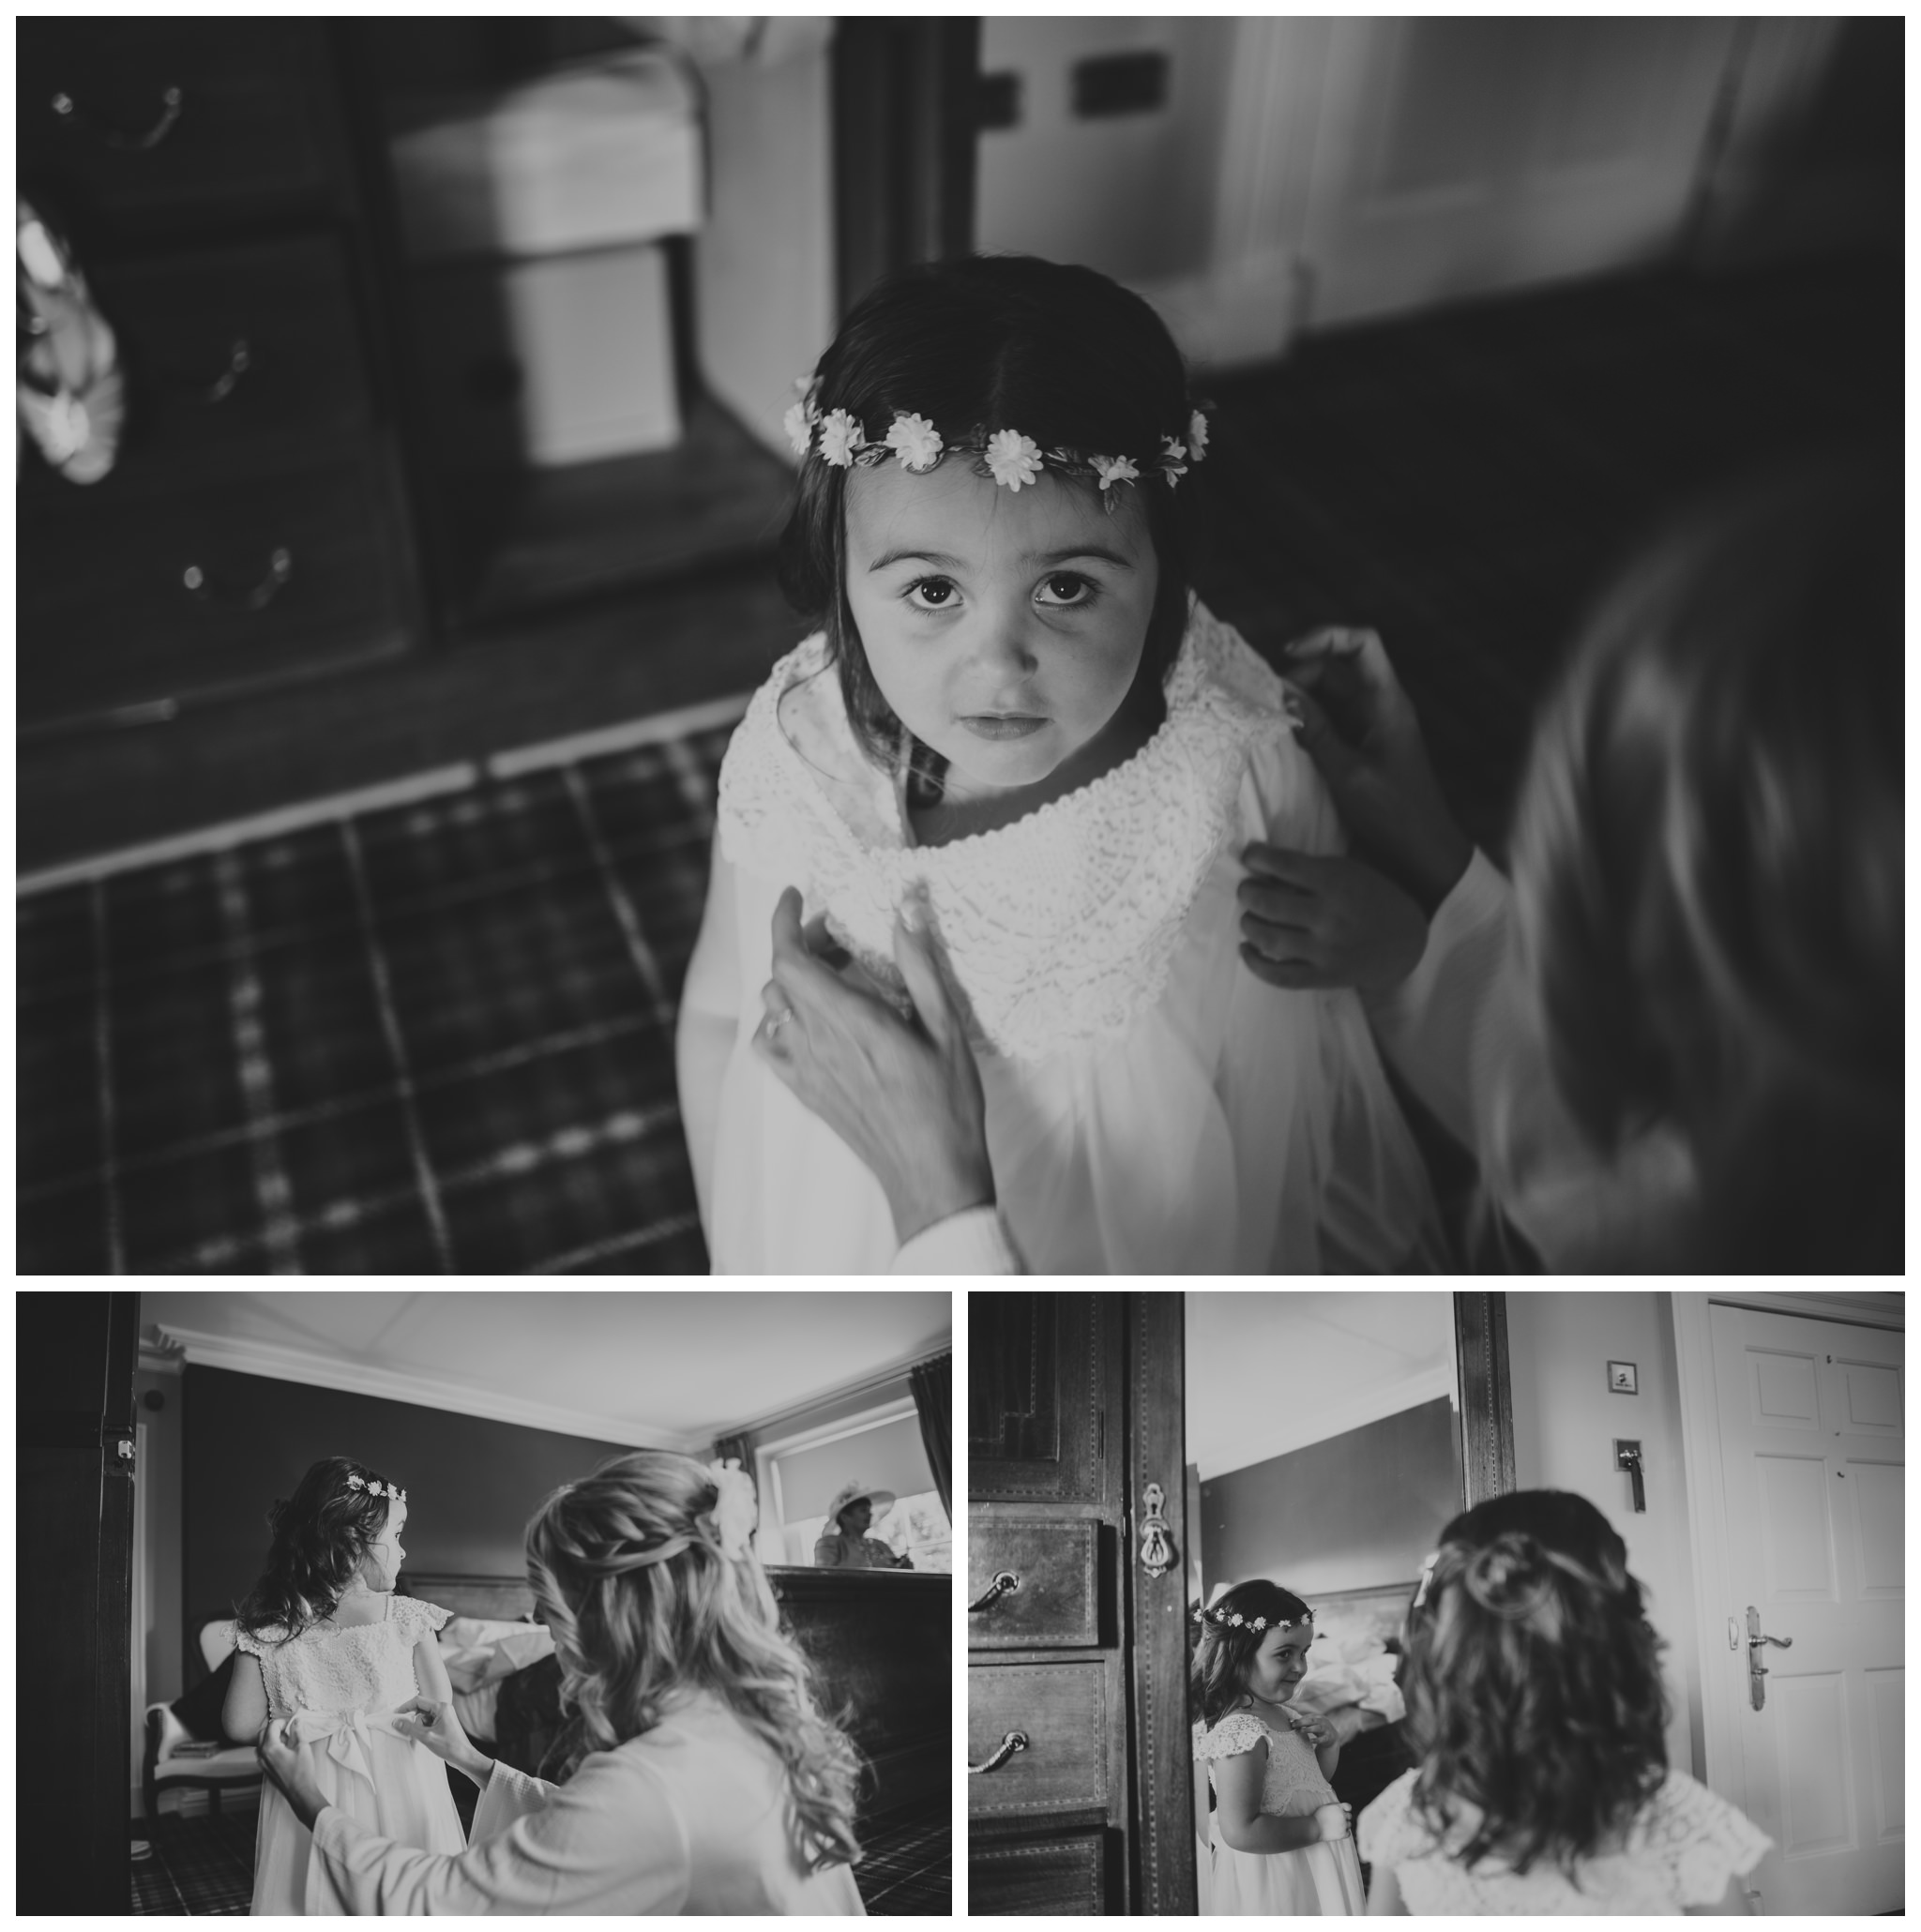 Richard Savage Photography - Wedding - Peterstone Court Brecon - 2016-05-11_0010